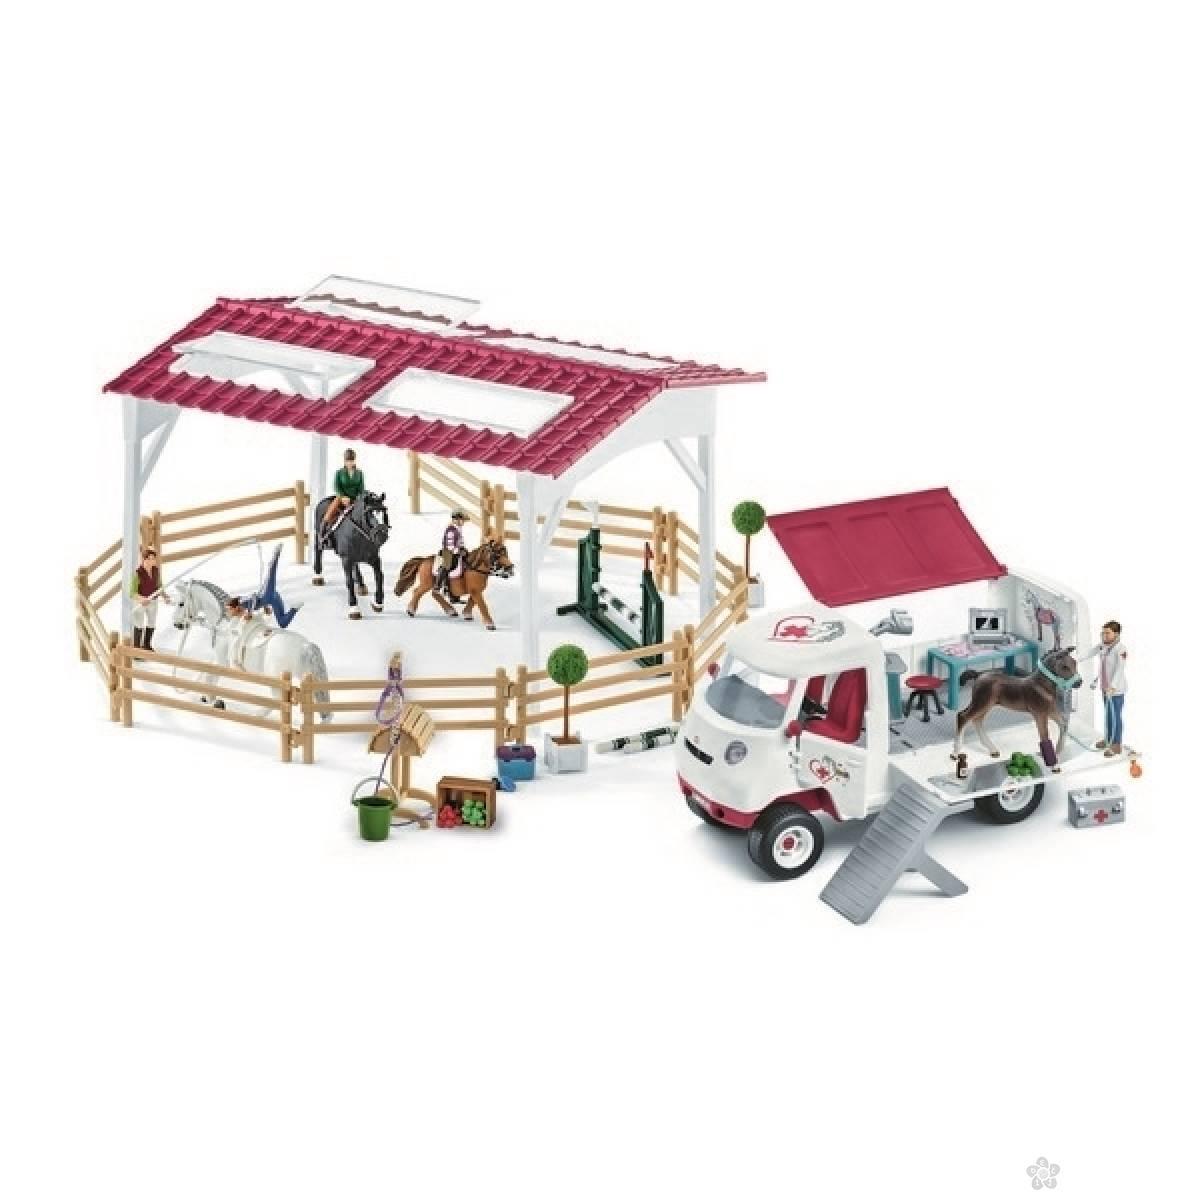 Set arena za jahanje i mobilna veterinarska stanica 72121